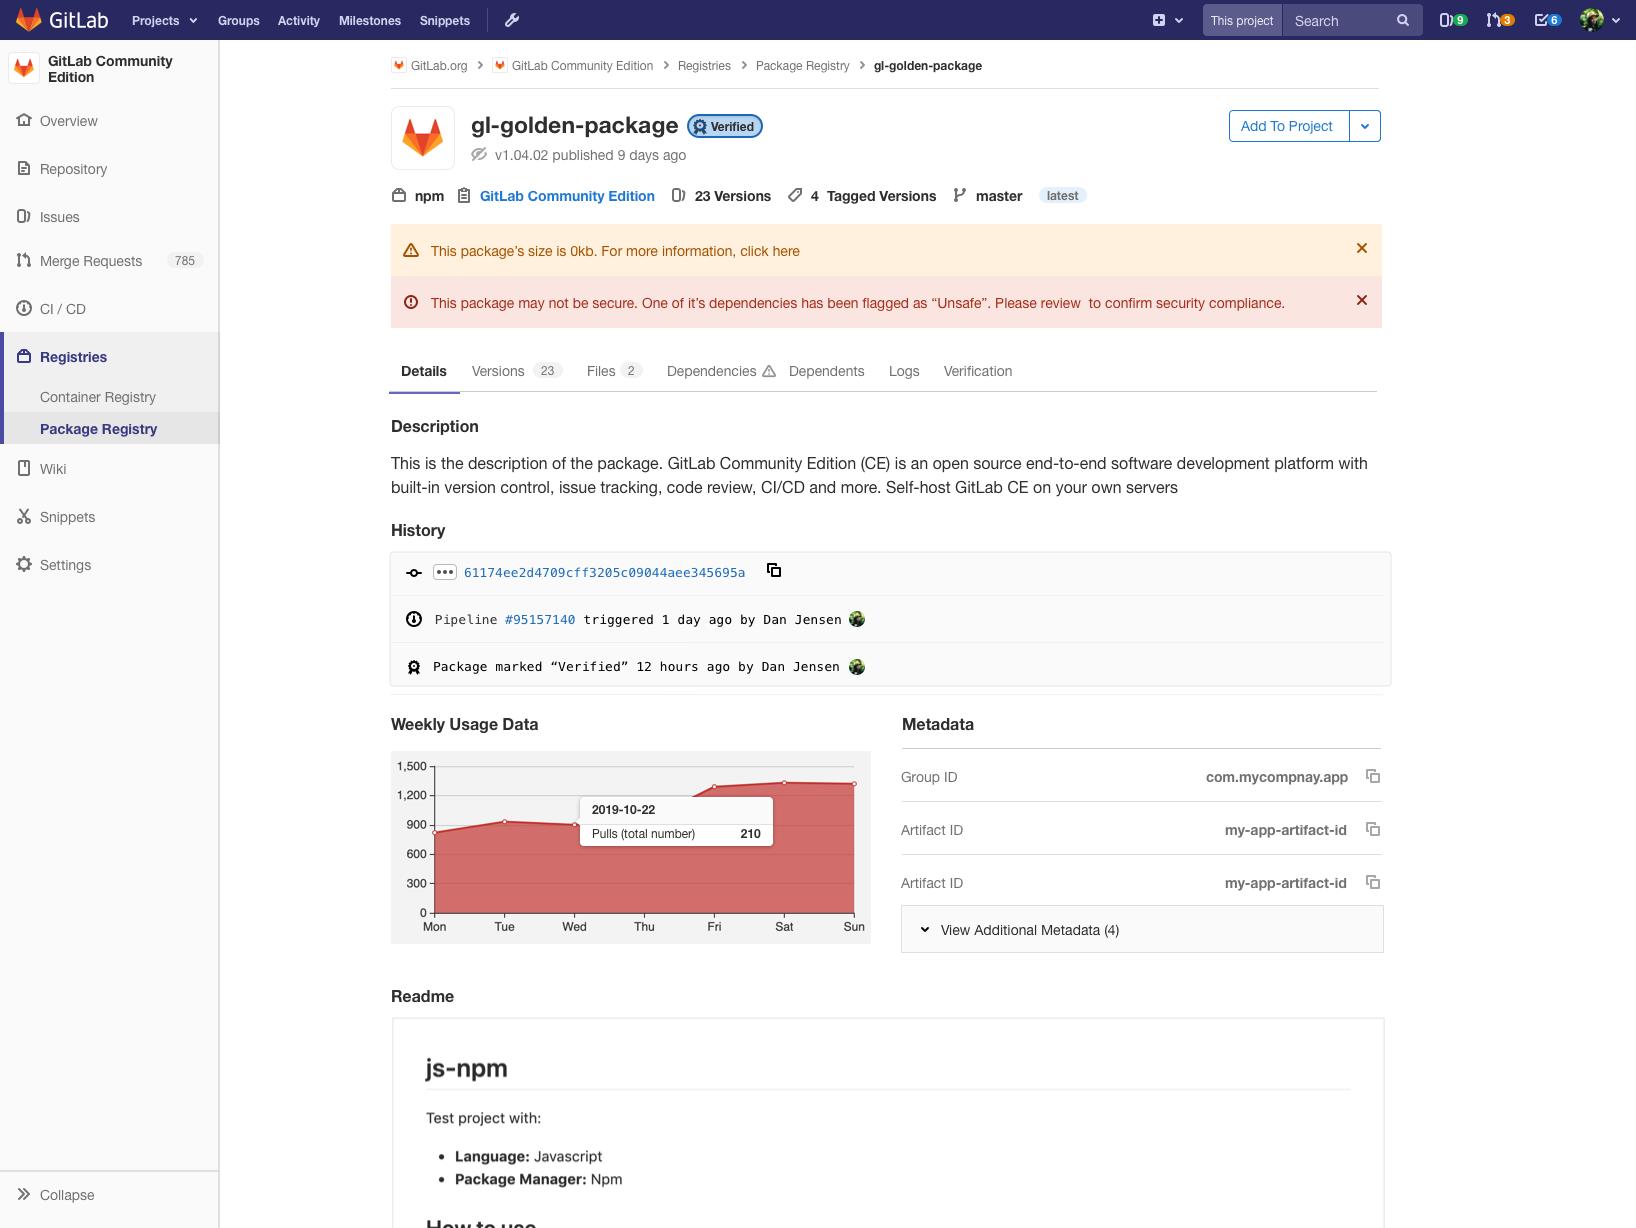 GitLab's Registries